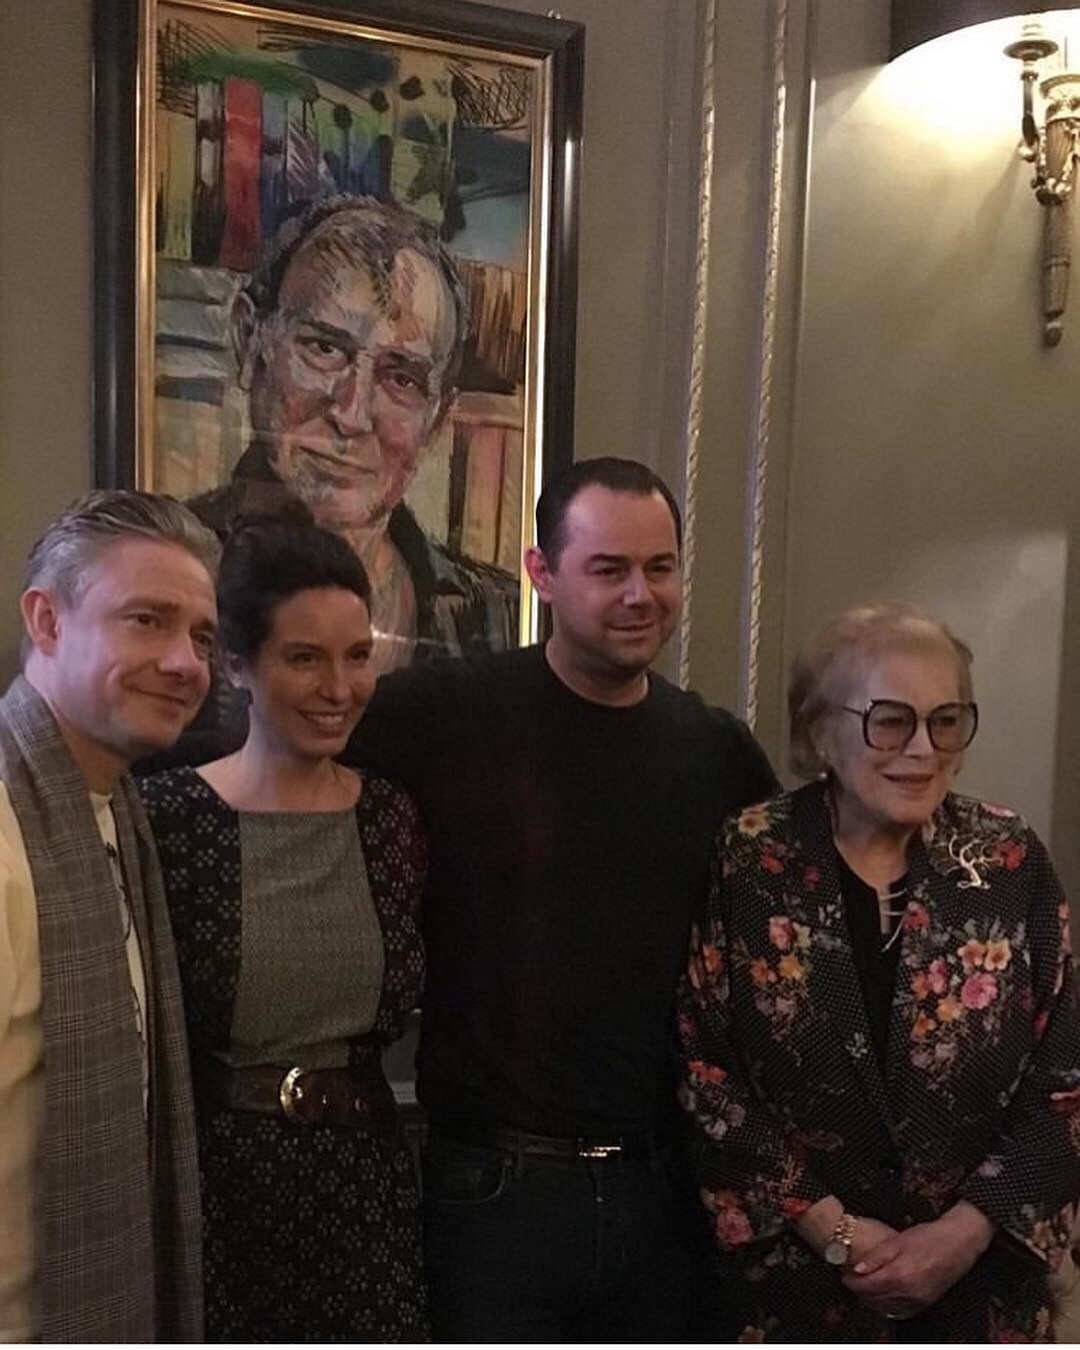 Martin Freeman, Amy Shuckburgh, Danny Dyer and Lady Antonia Fraser